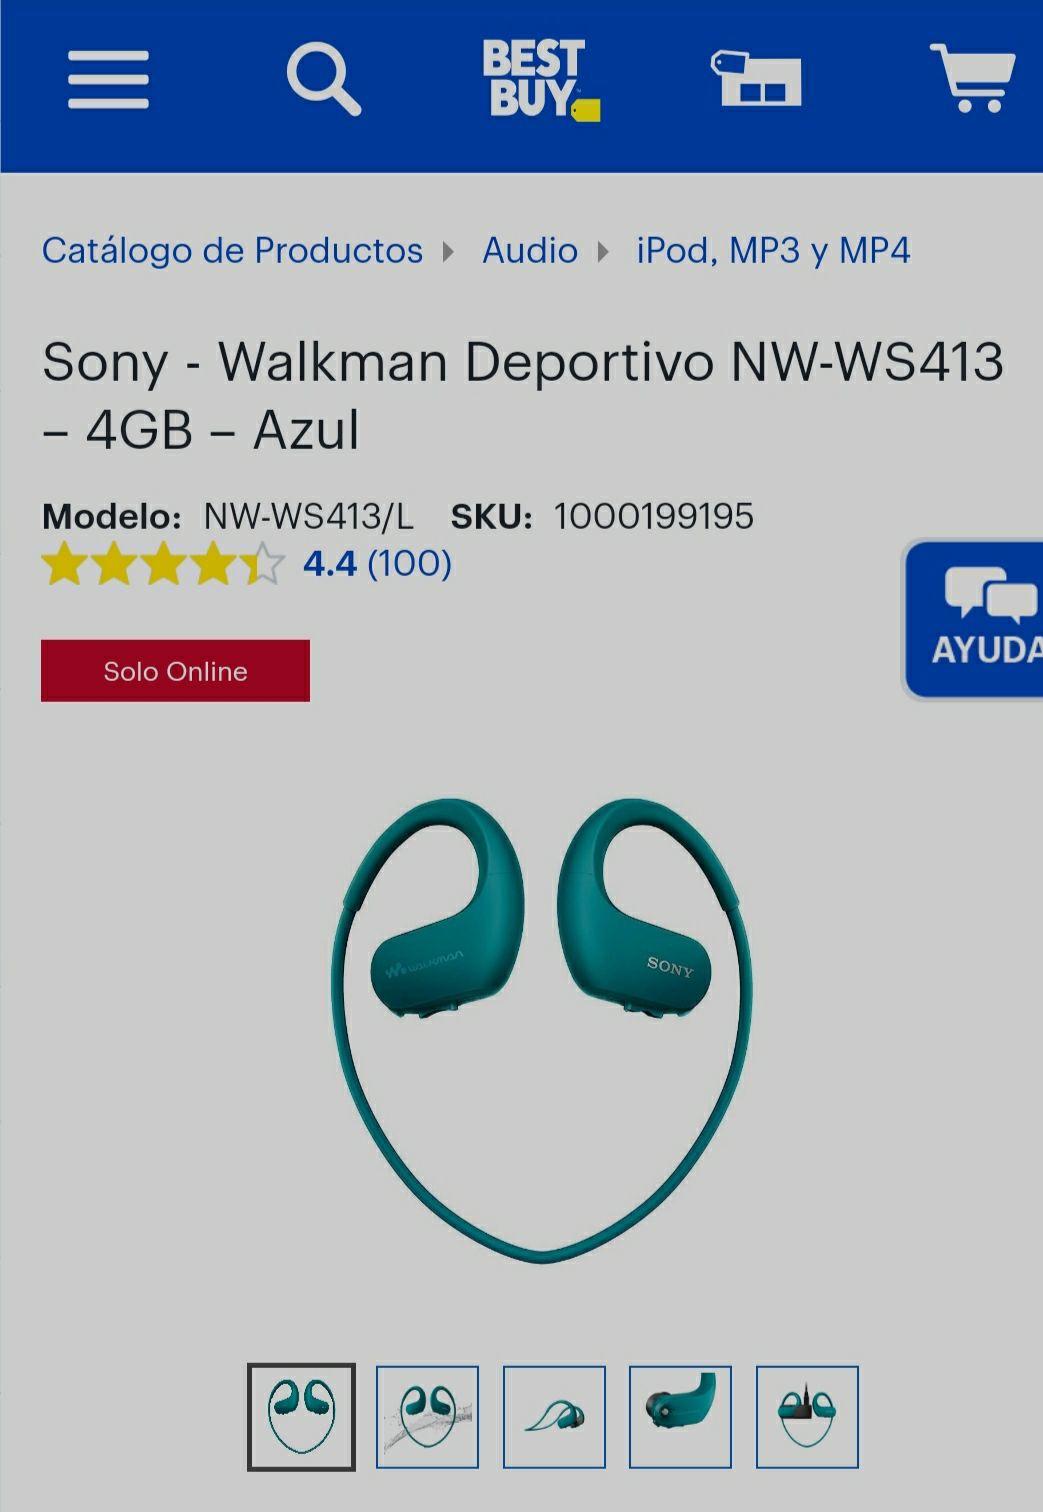 Best Buy: Sony walkman 4gb